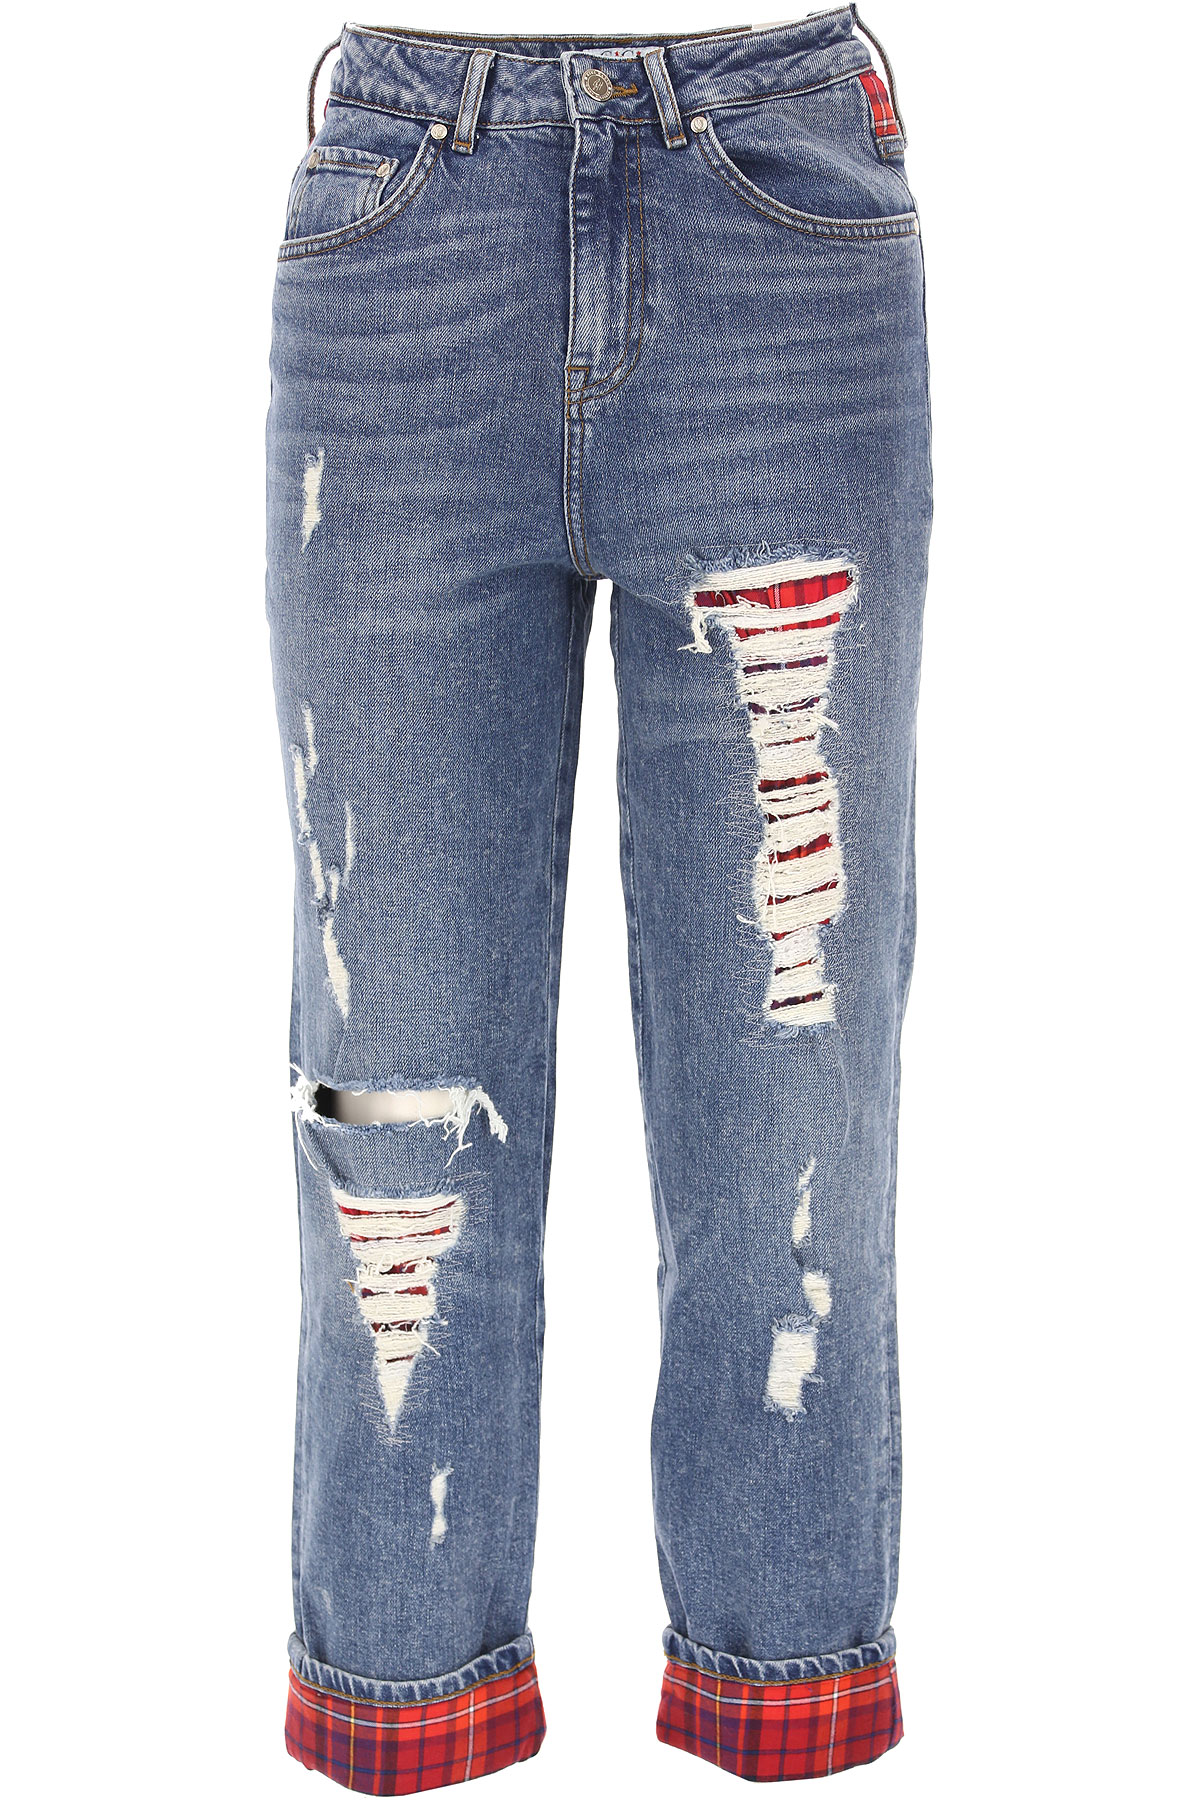 Tommy Hilfiger Jeans On Sale in Outlet, Denim, Cotton, 2017, 26 27 29 USA-424811